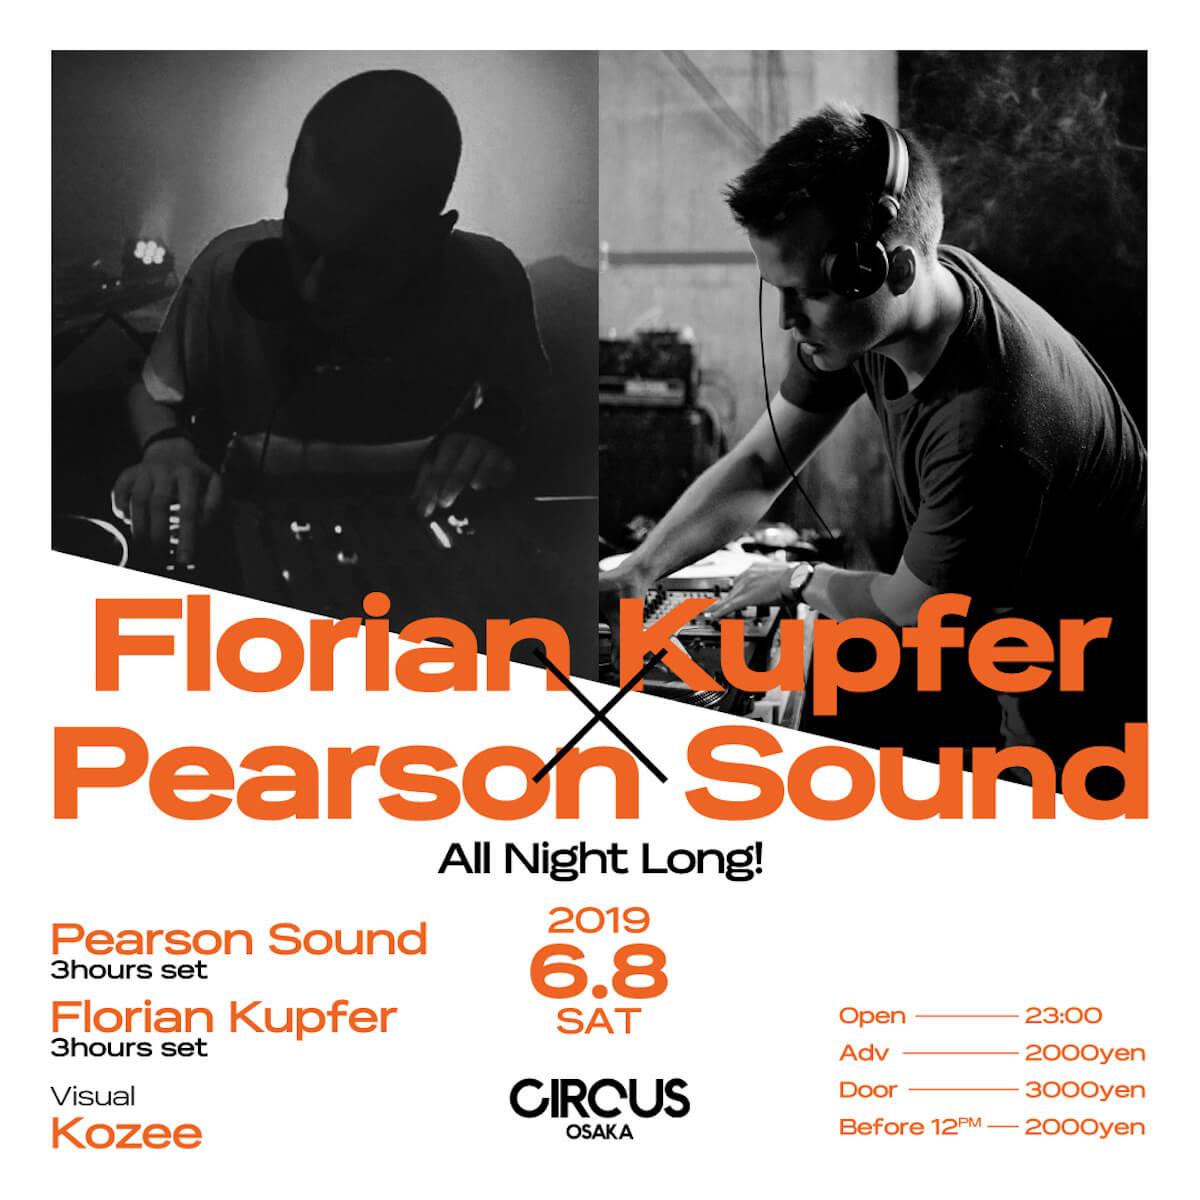 <FFKT>にも出演!Florian KupferのJapan Tourが決定|〈L.I.E.S. Records〉からもリリース music190425_floriankupfer_1